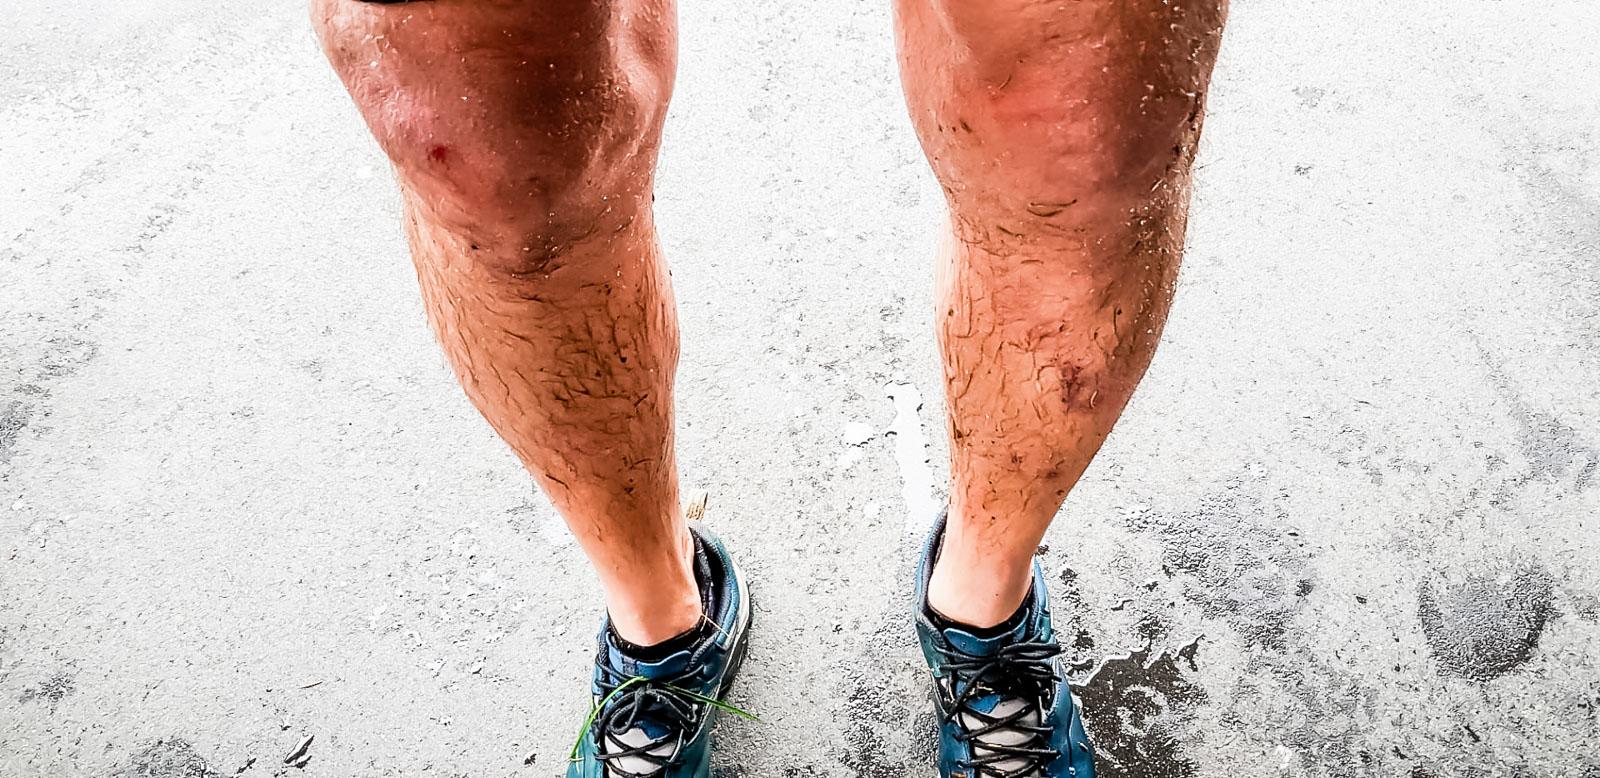 Dreckige Beine